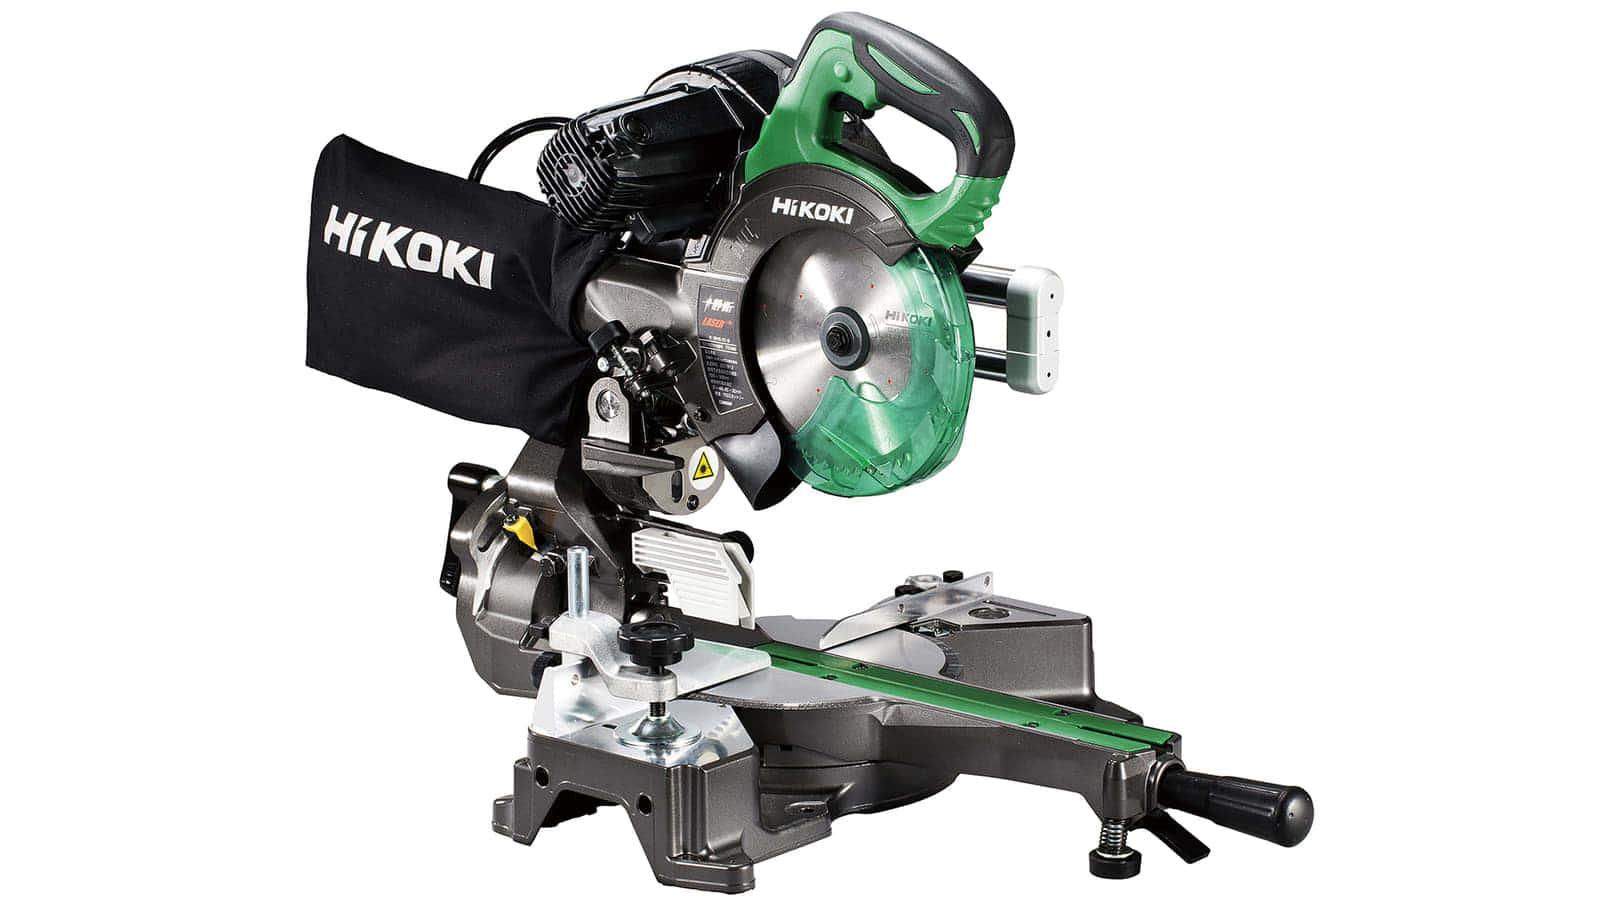 HiKOKI C6RSHD 165mm卓上スライド丸のこ、8寸切断・静音2段ベルトのACモデル